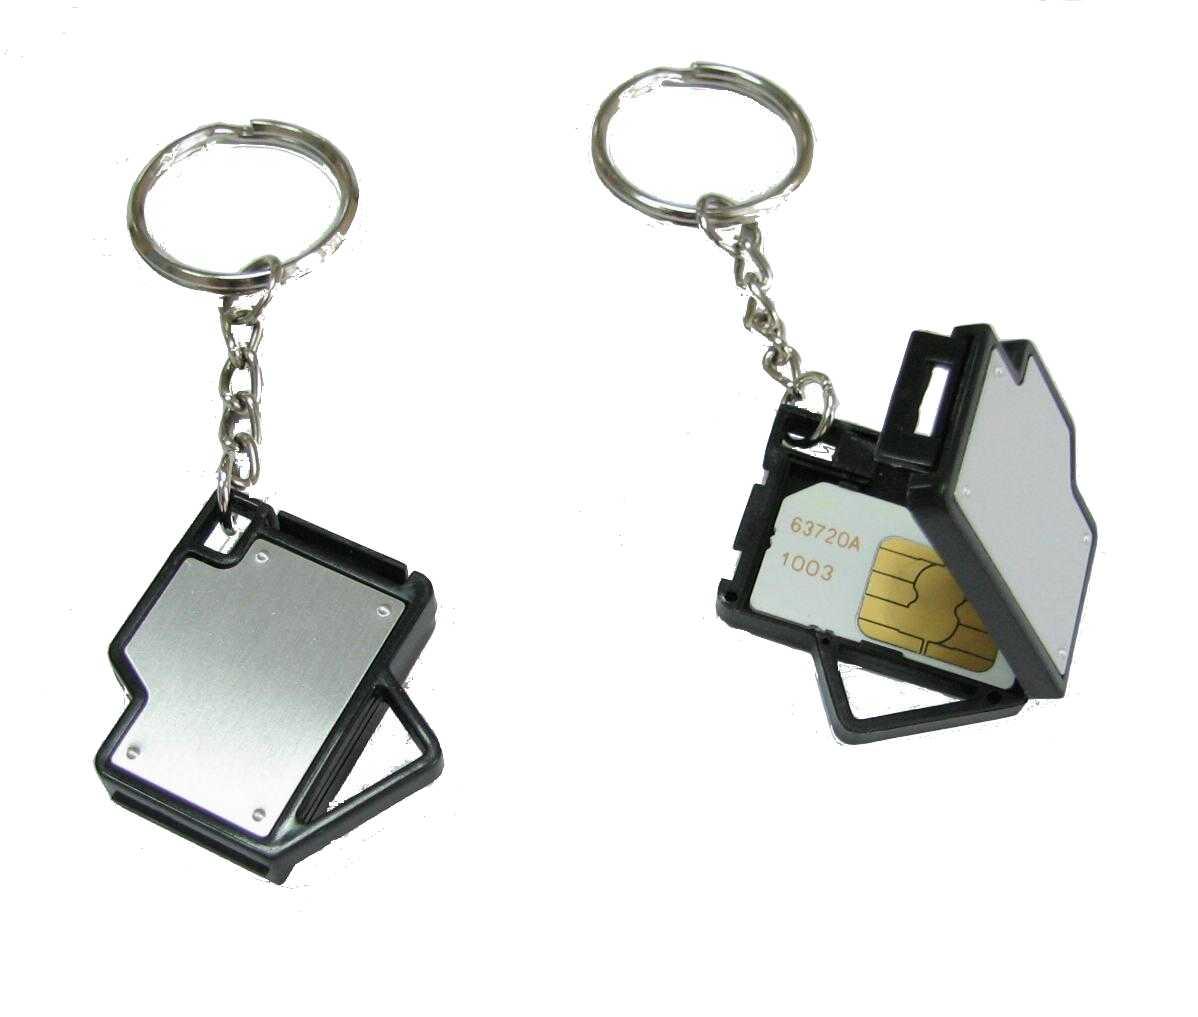 Key Chain With Sim Card Holder